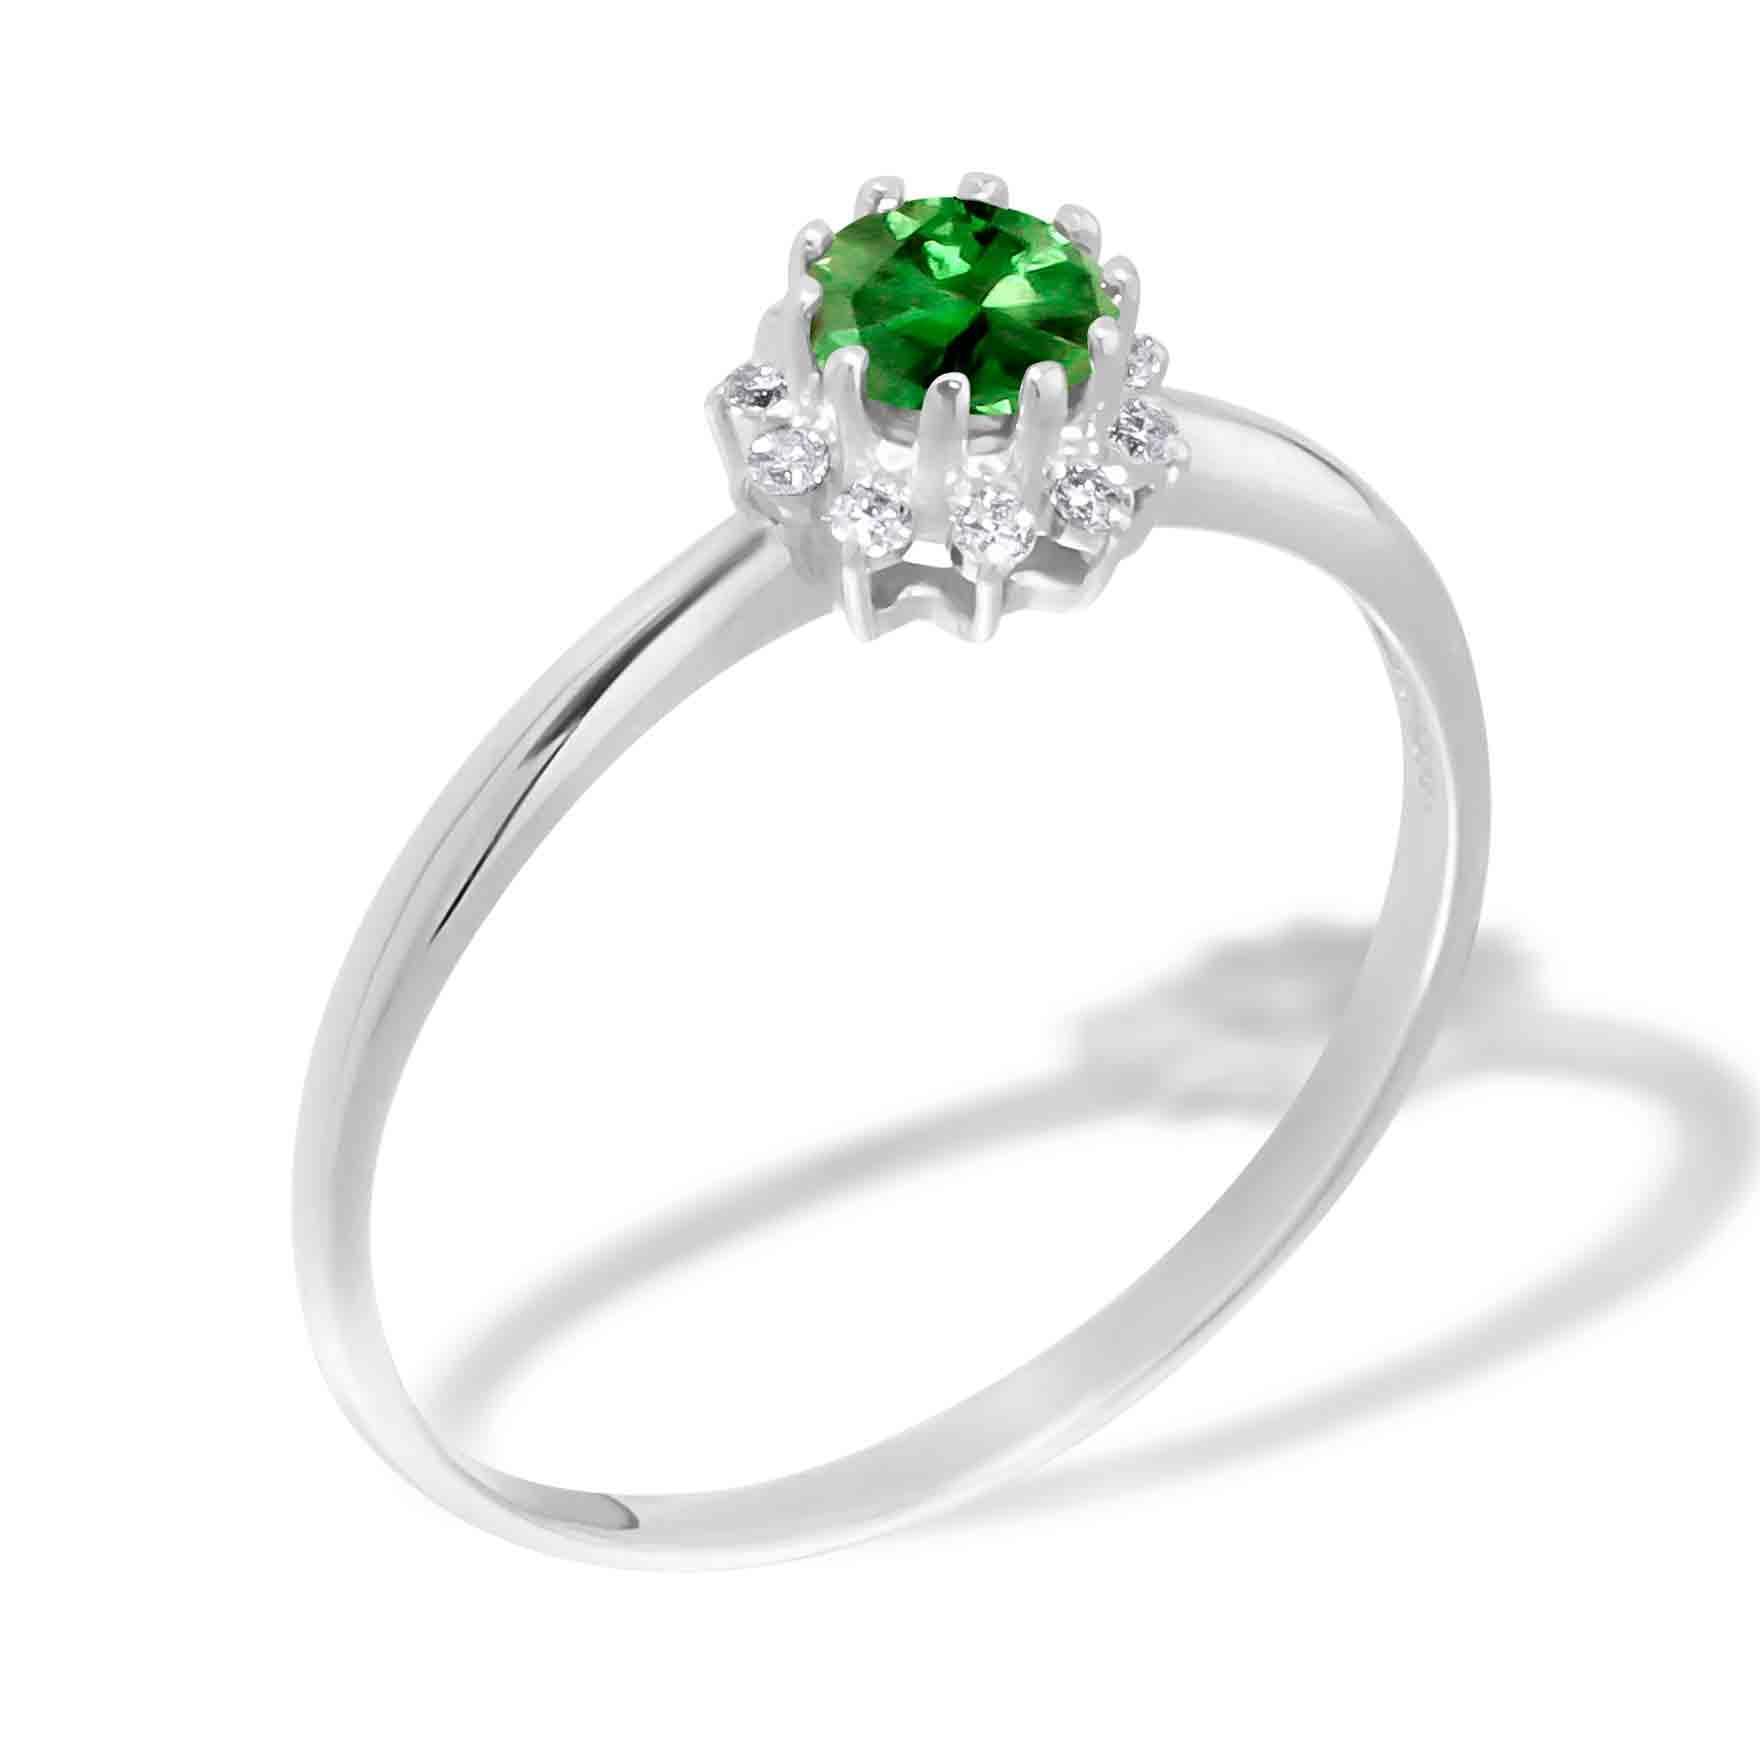 1369c8ecc135b Emerald and Diamond Ring